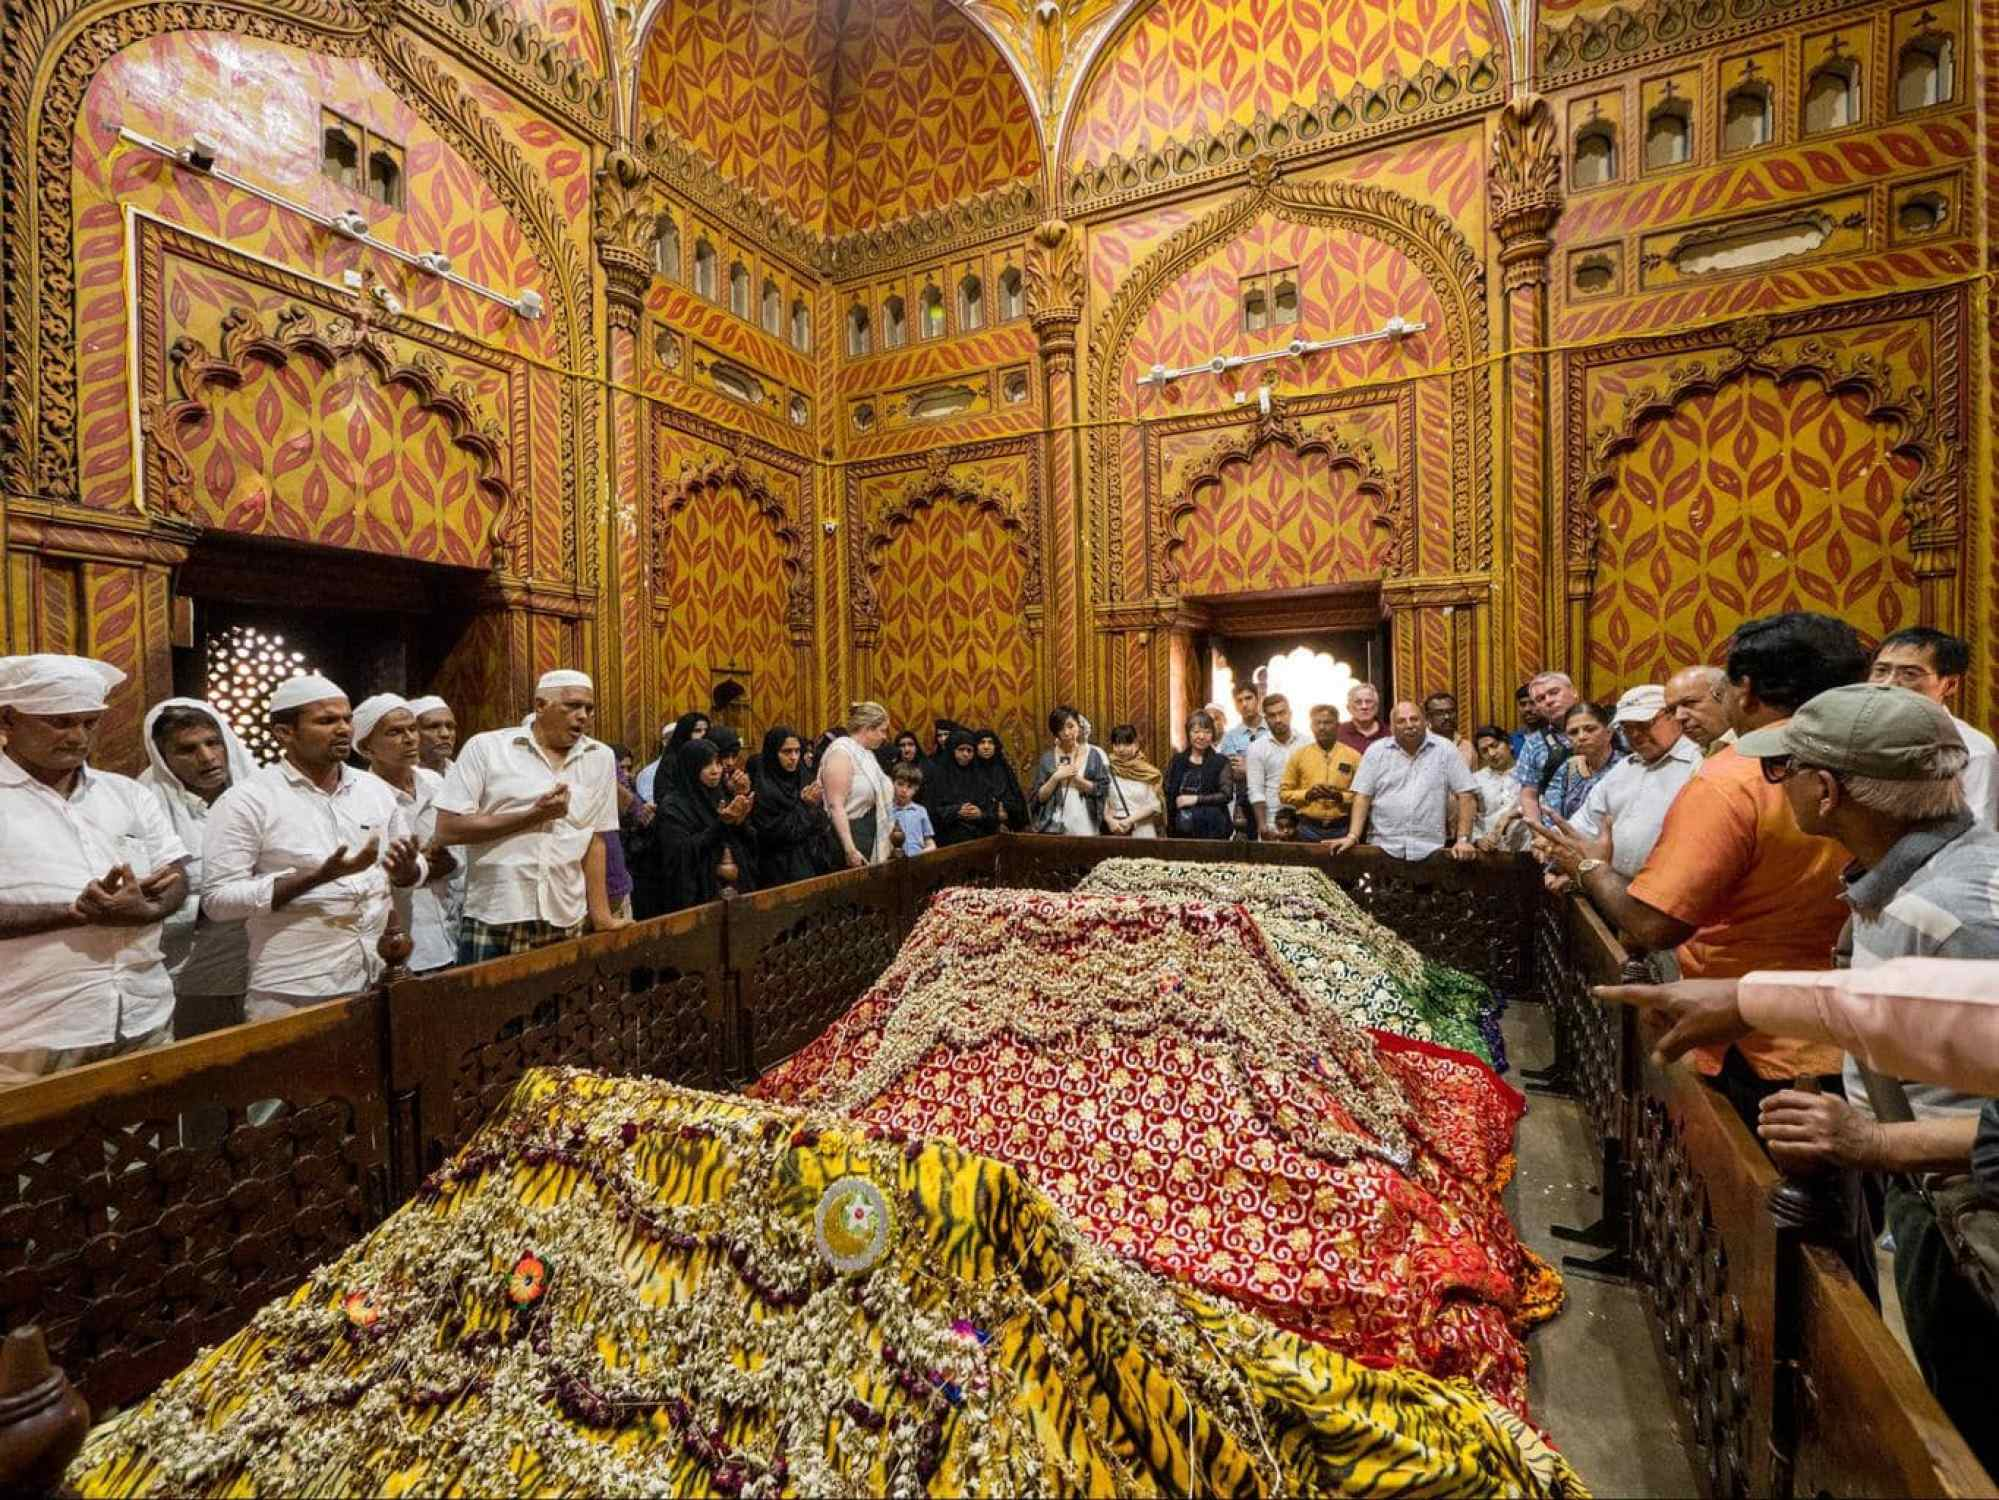 Tipu Sultan's tomb